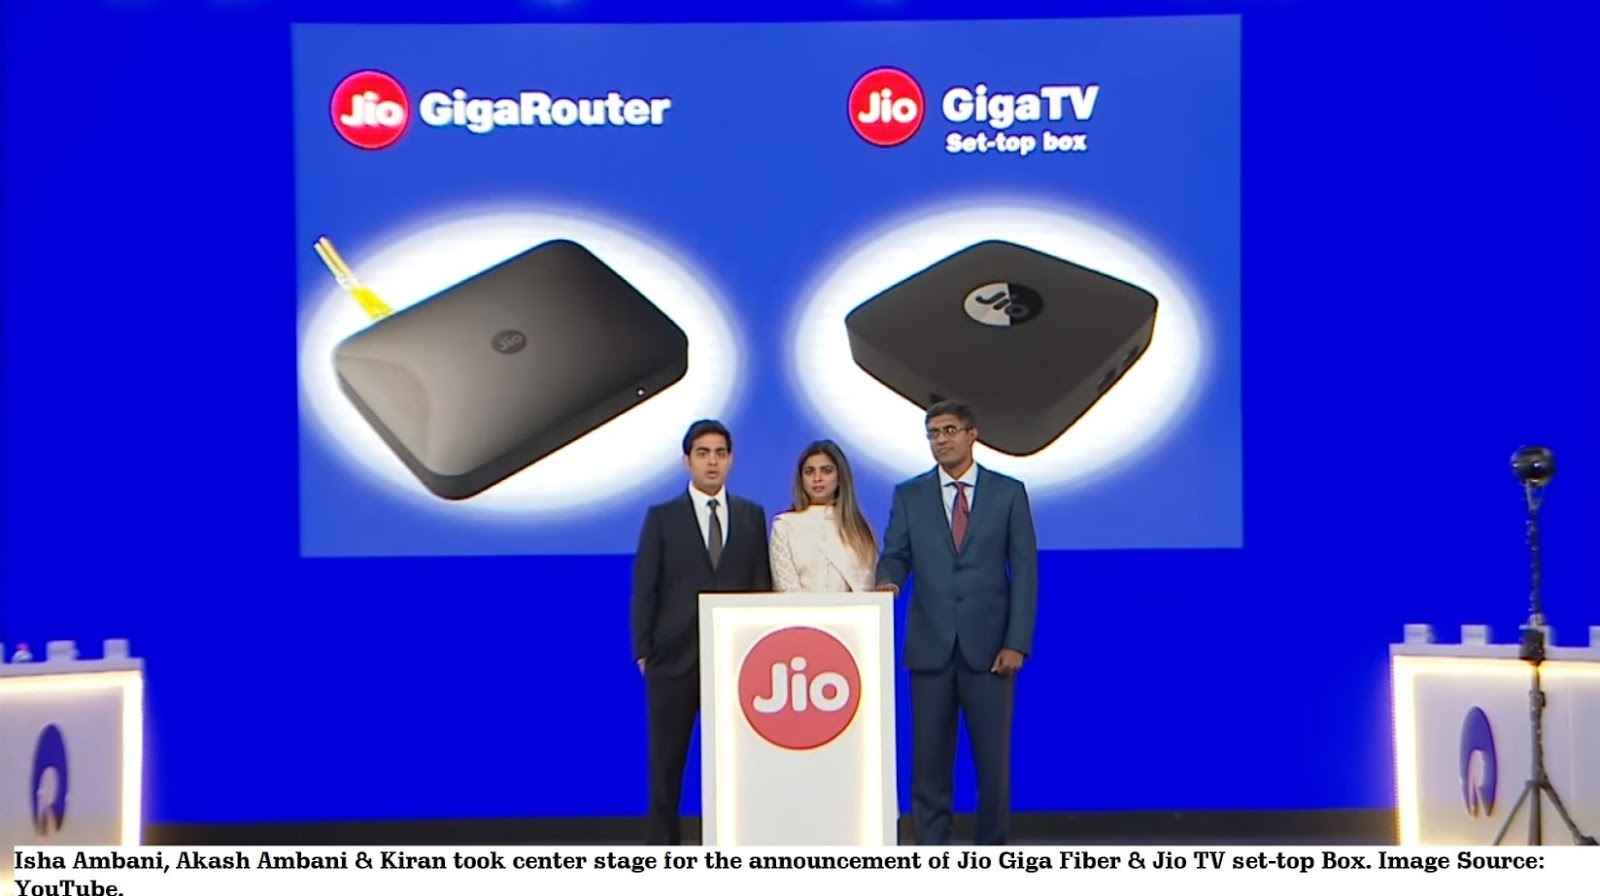 Finally, Wait is Over: Jio Giga Fiber & Jio Giga TV Set-Top